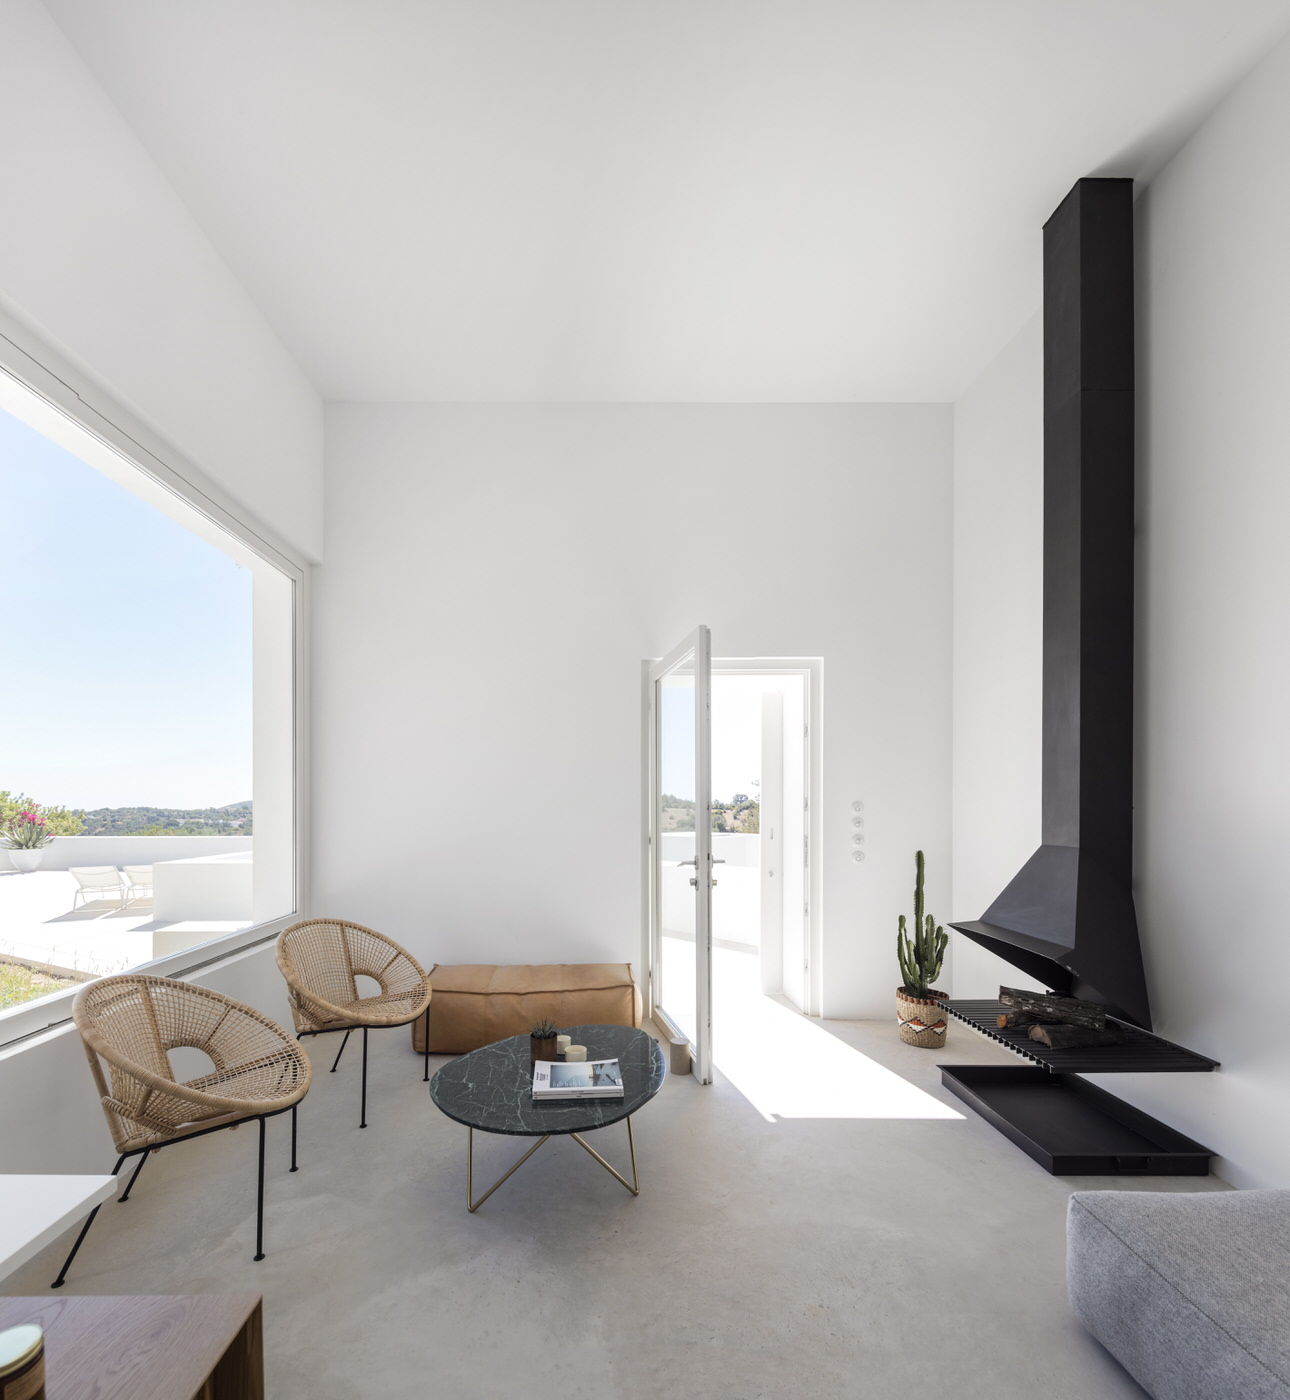 Zalig-Algarve-Casa-Luum-123-1_1